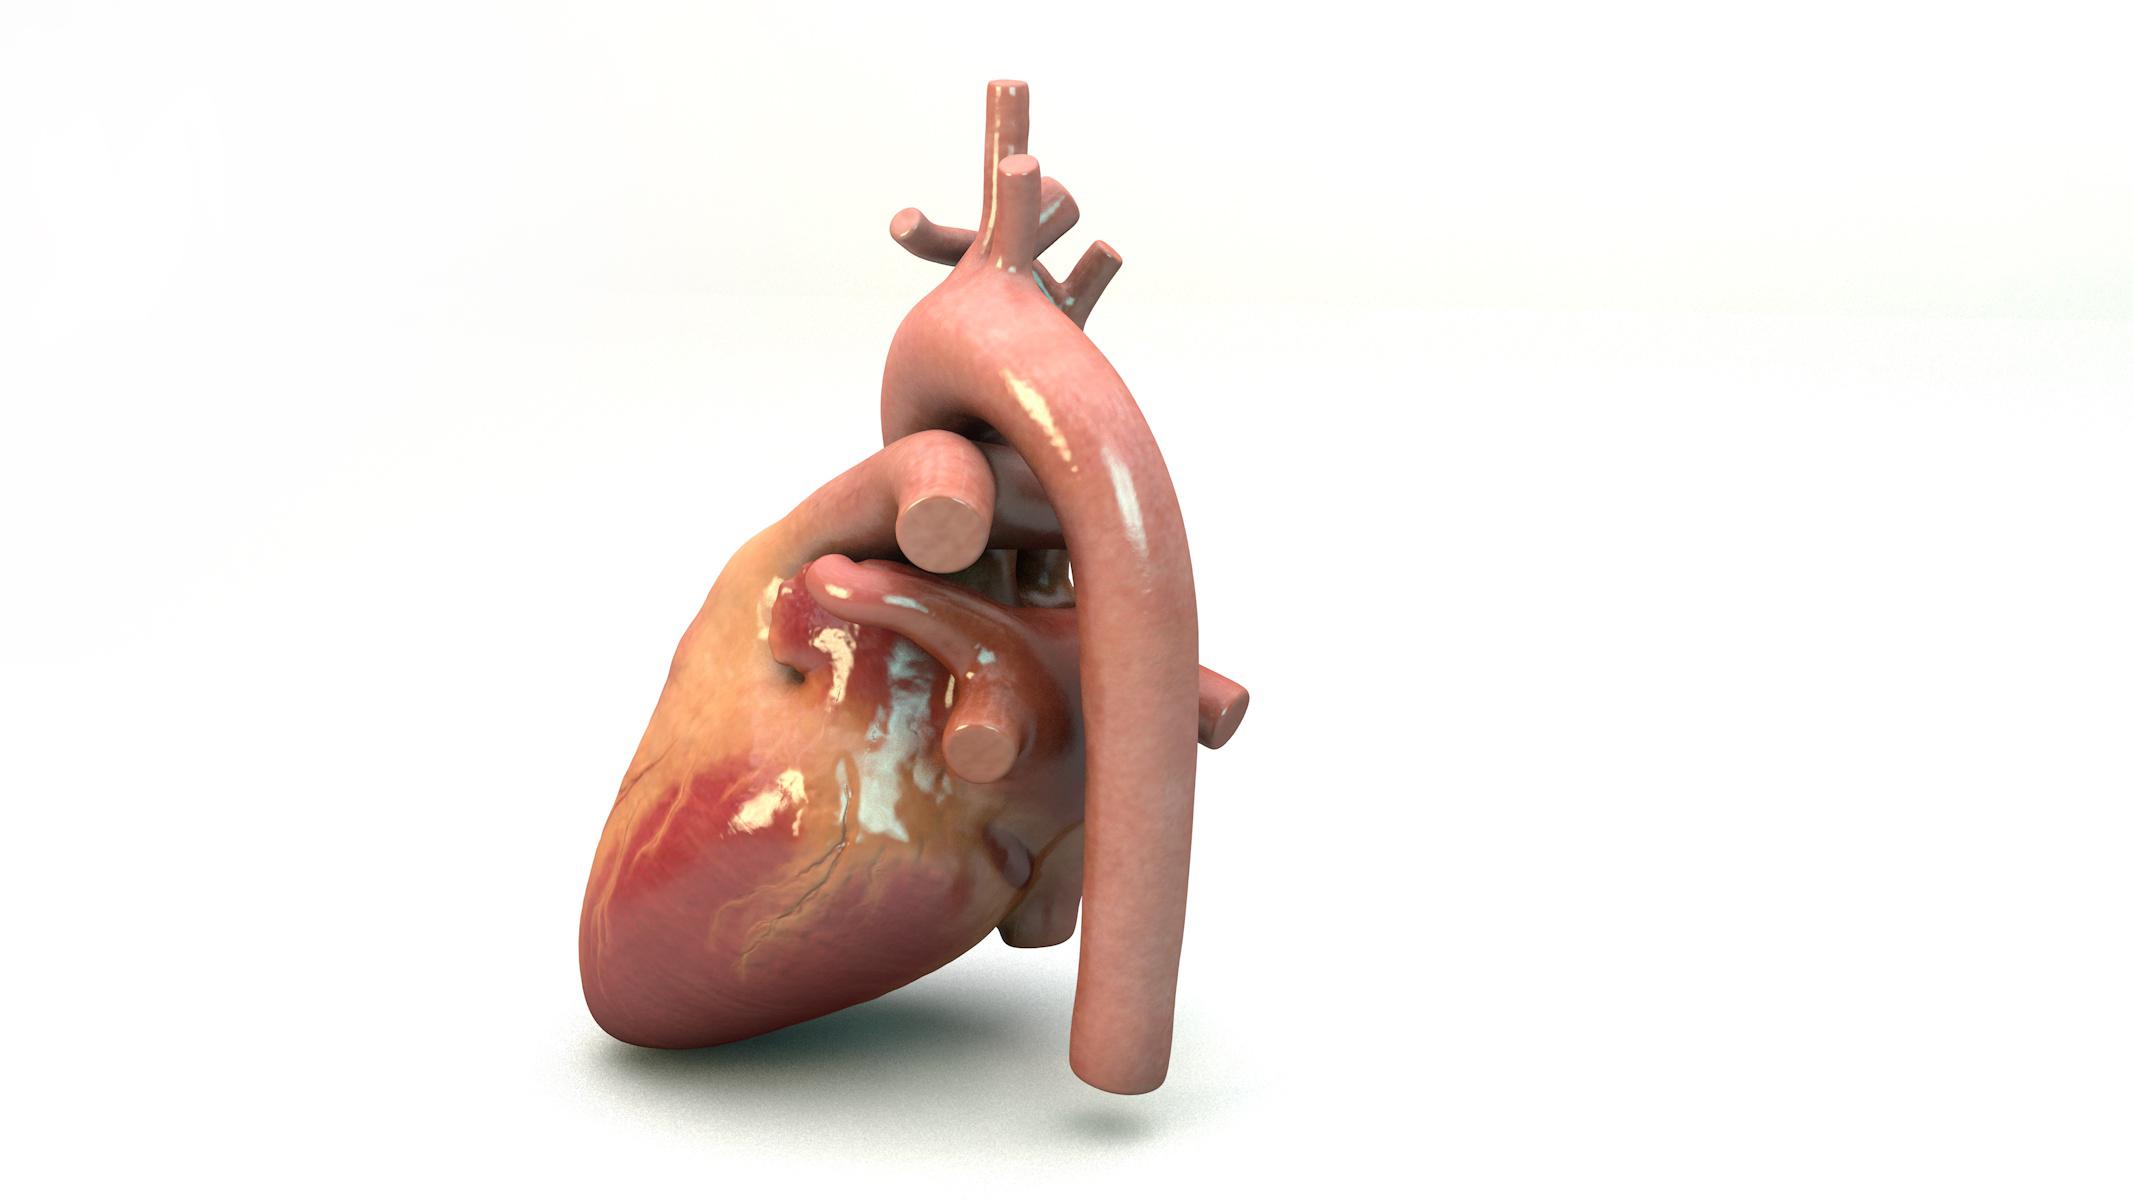 HeartModel072618-Posterior.jpg